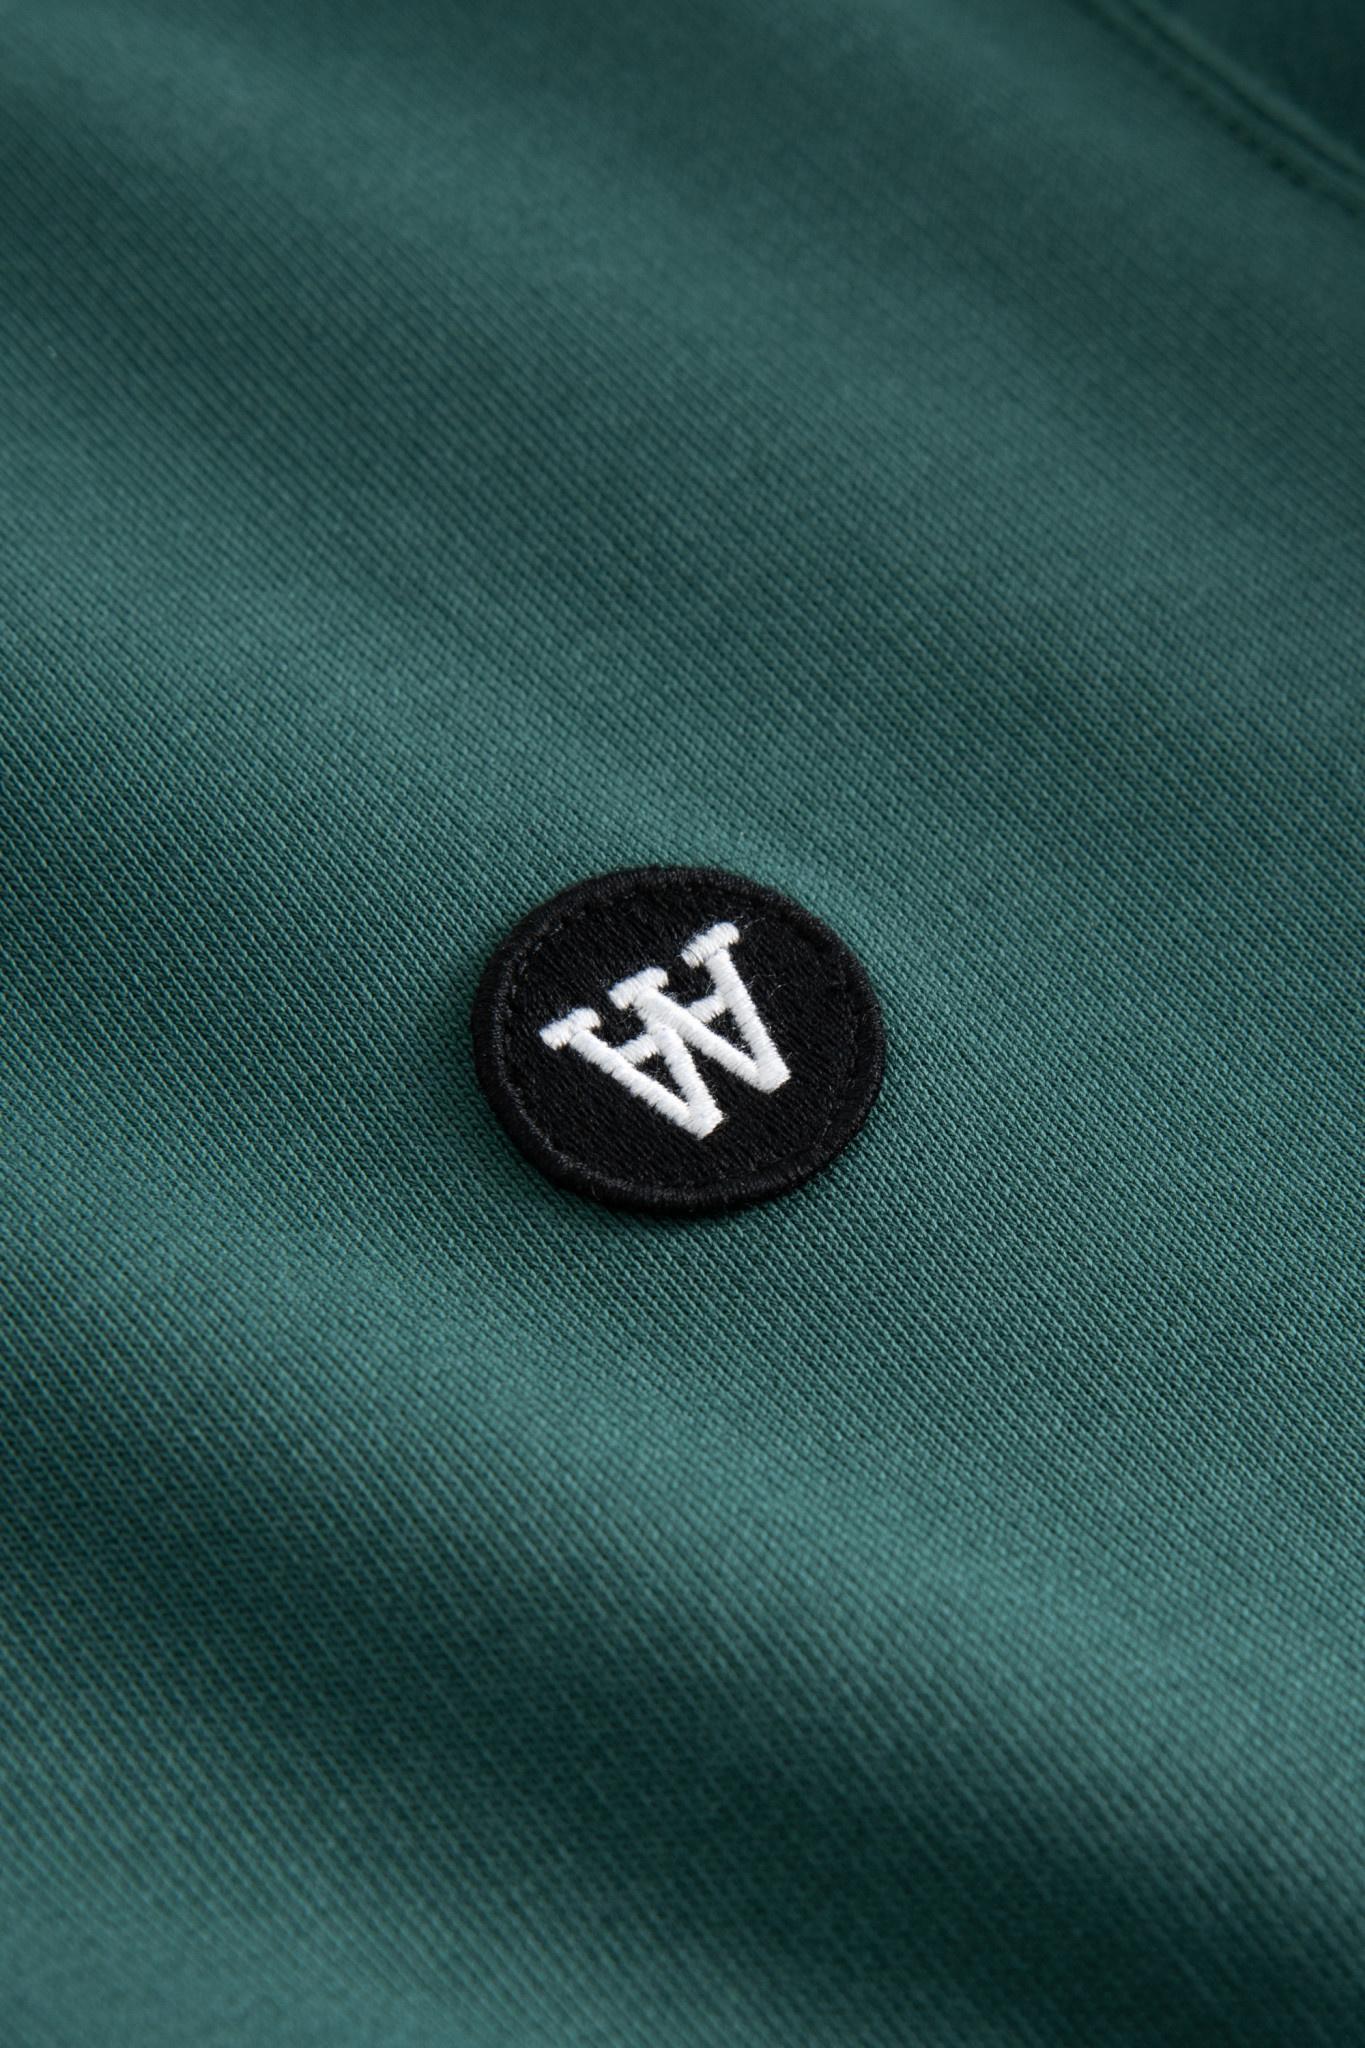 Tye katoenen Sweatshirt Gewassen Groen-2